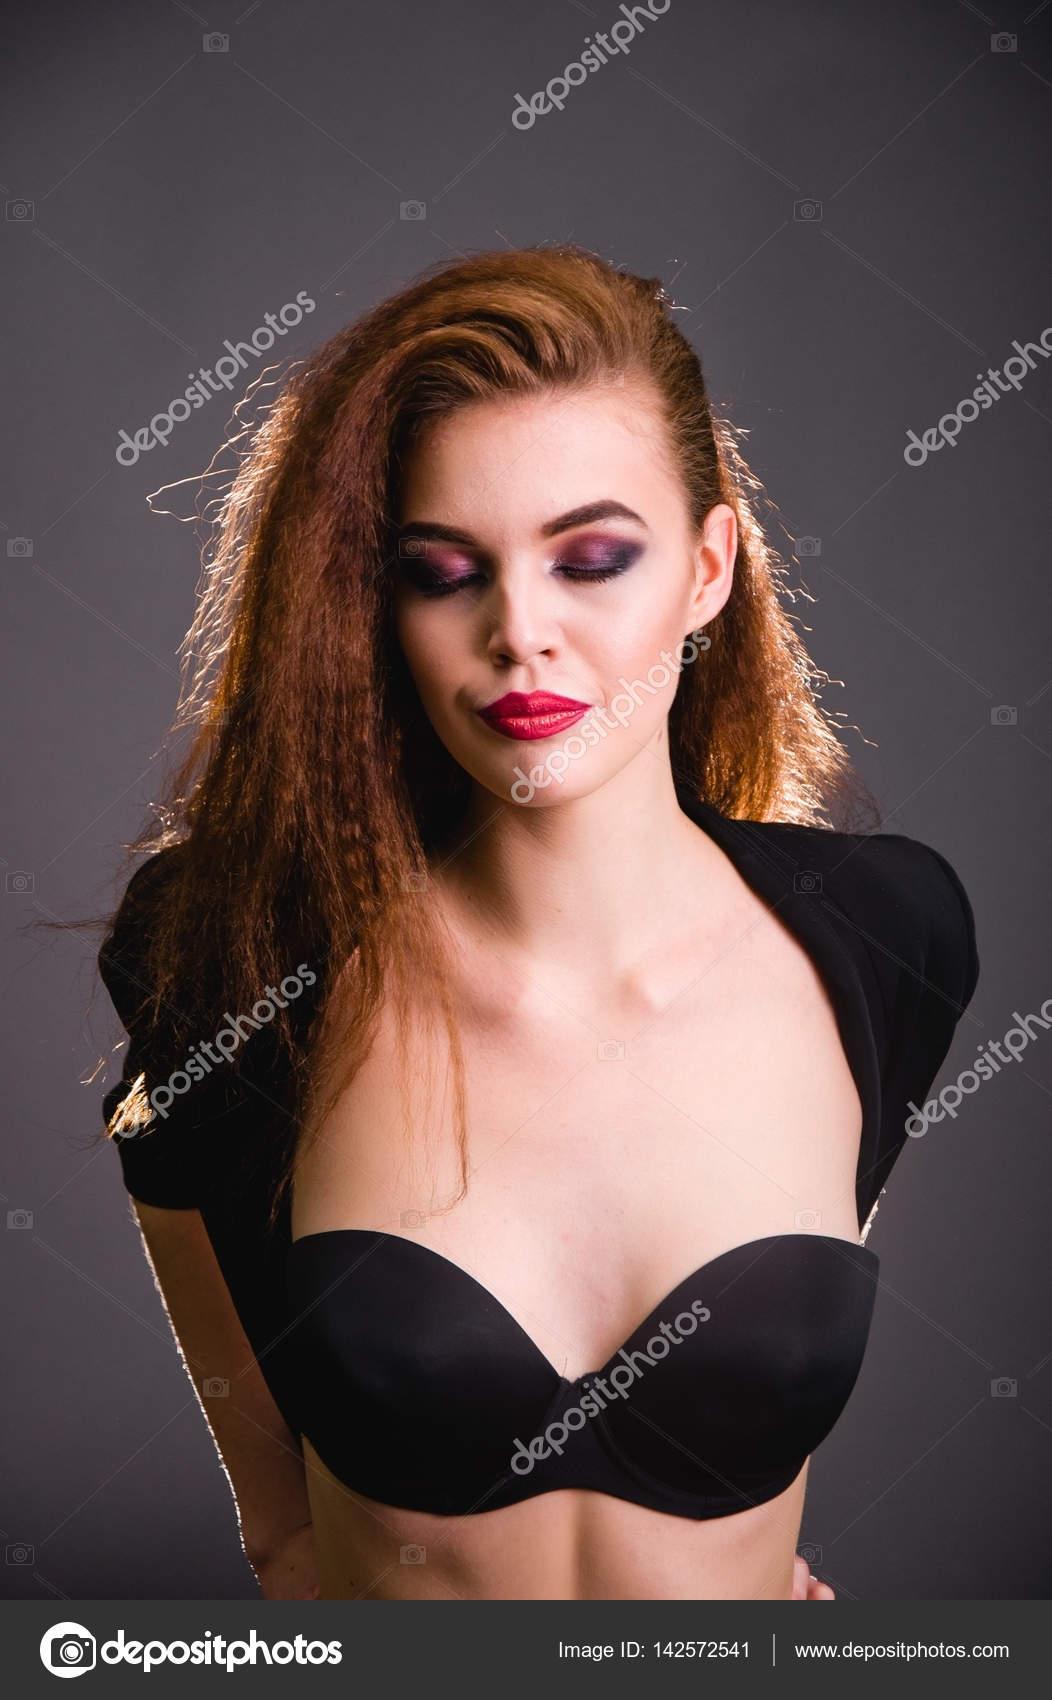 Ukraine tall slim sex girl